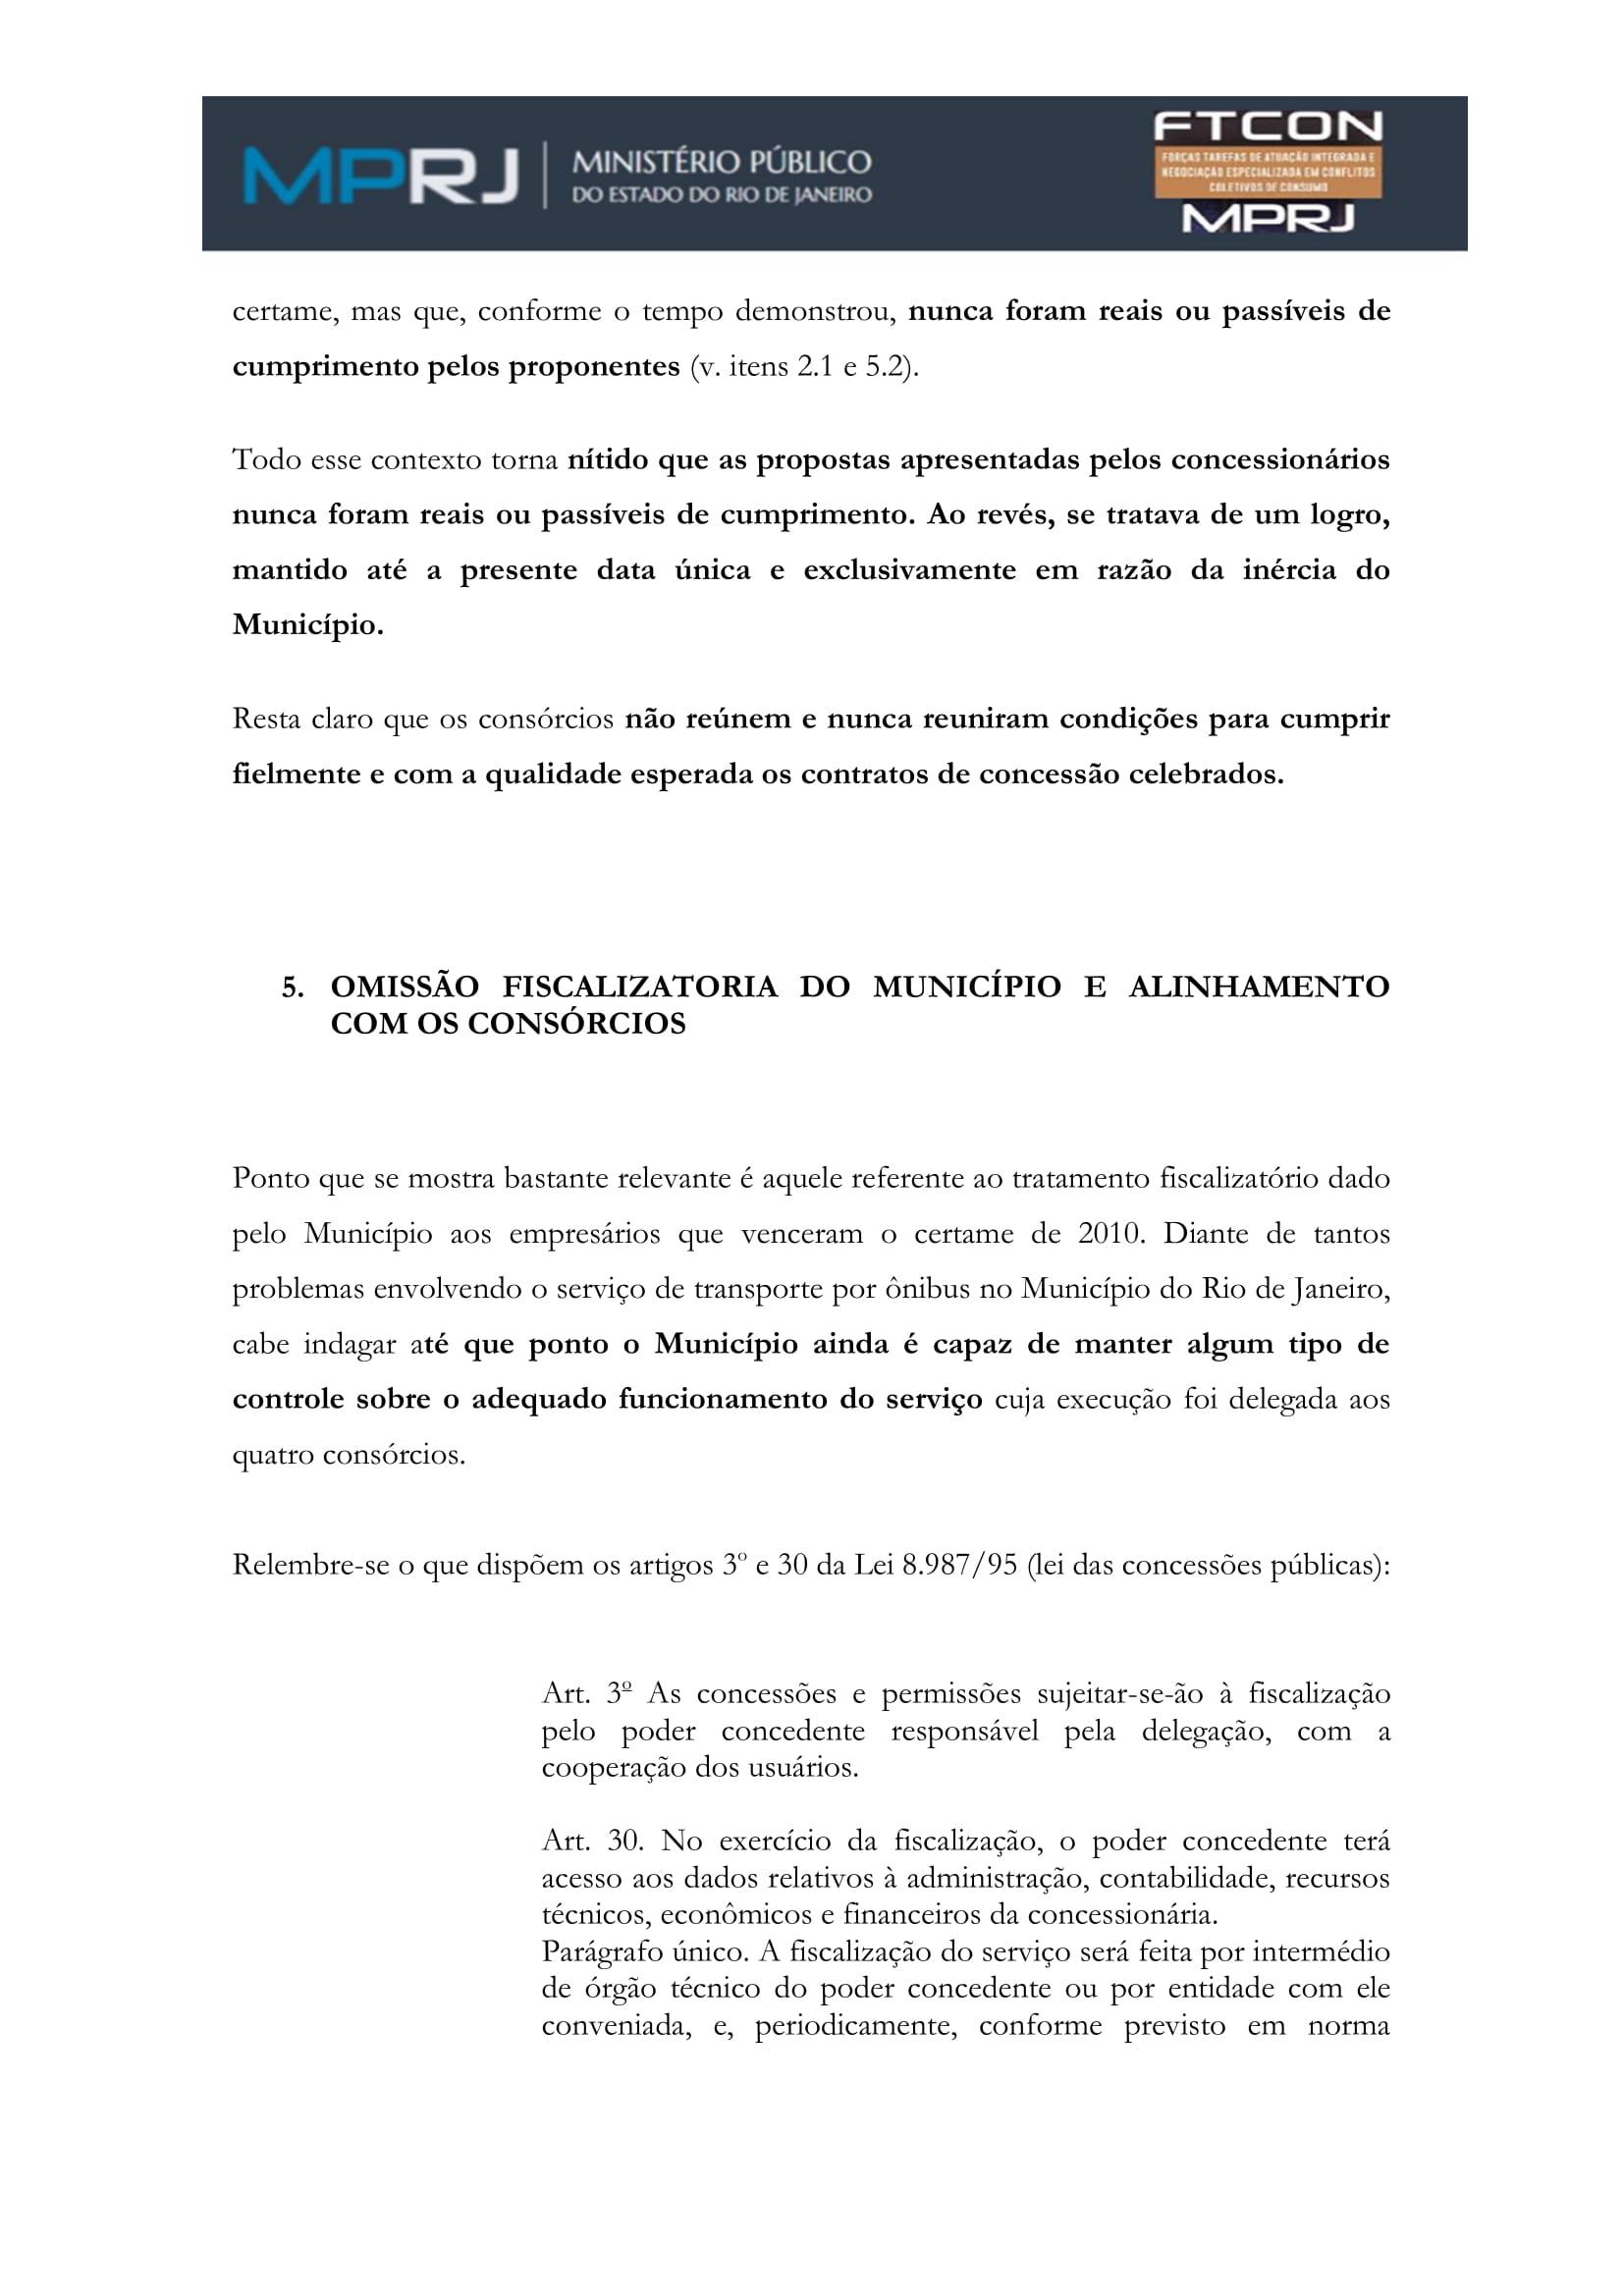 acp_caducidade_onibus_dr_rt-101